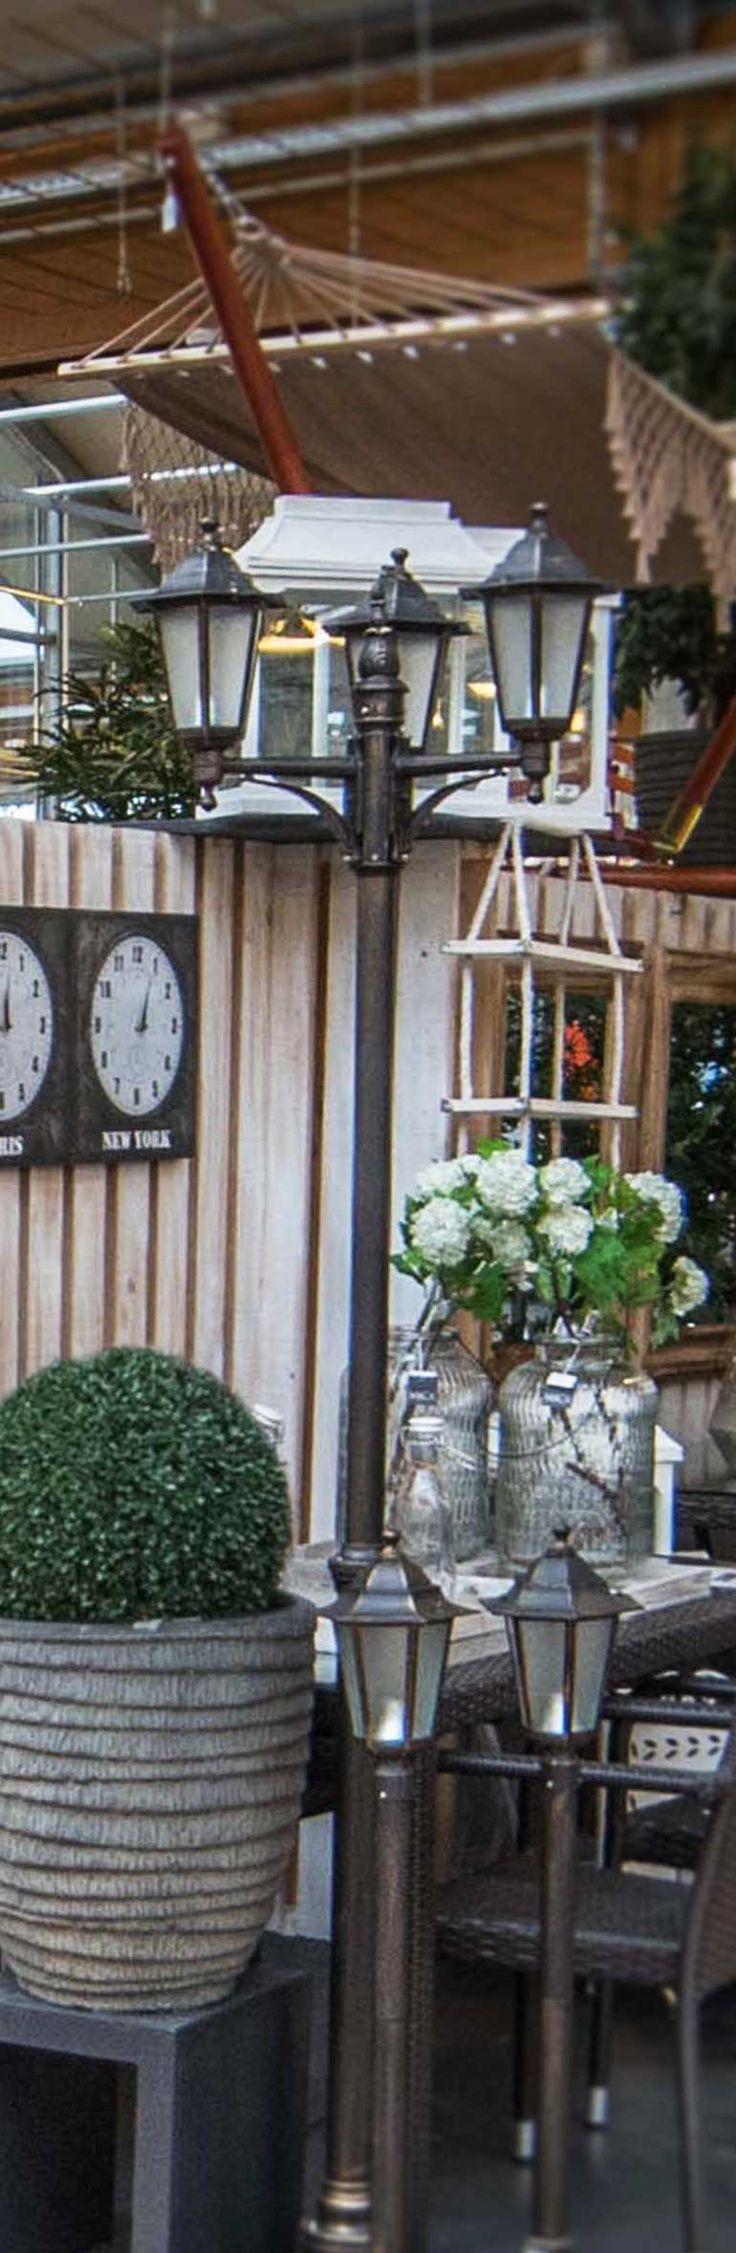 Trasform your garden in a small and romantic Parisian square. #decor #outdoor